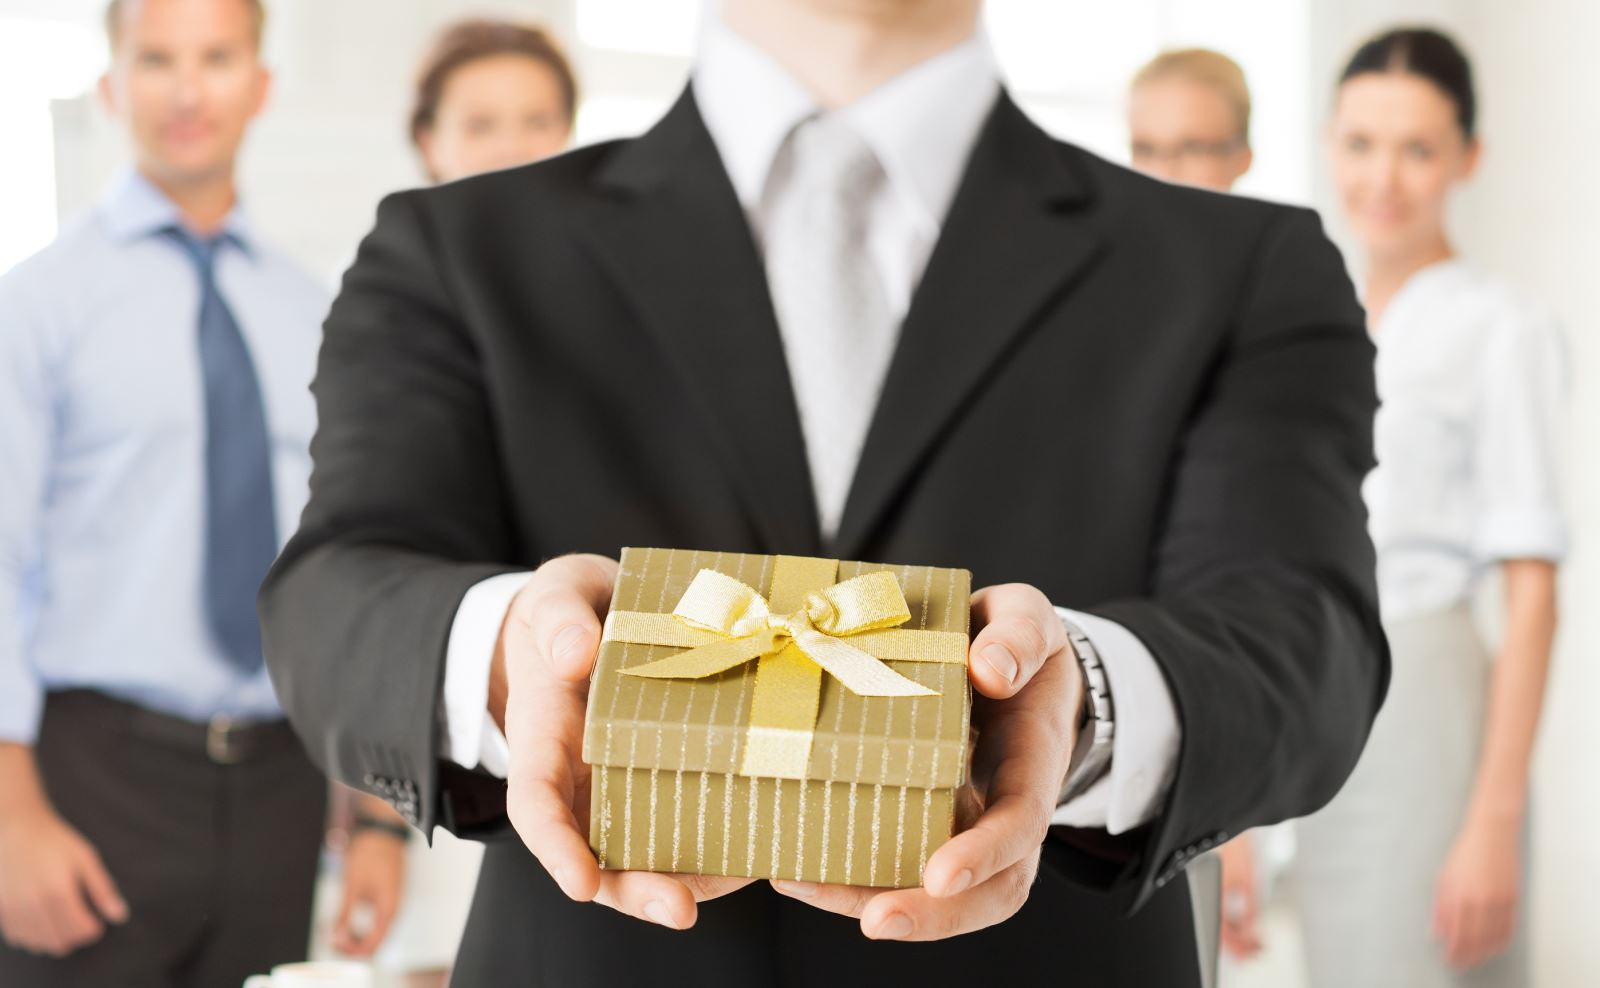 Luxury car giant gives all staff $13K bonus